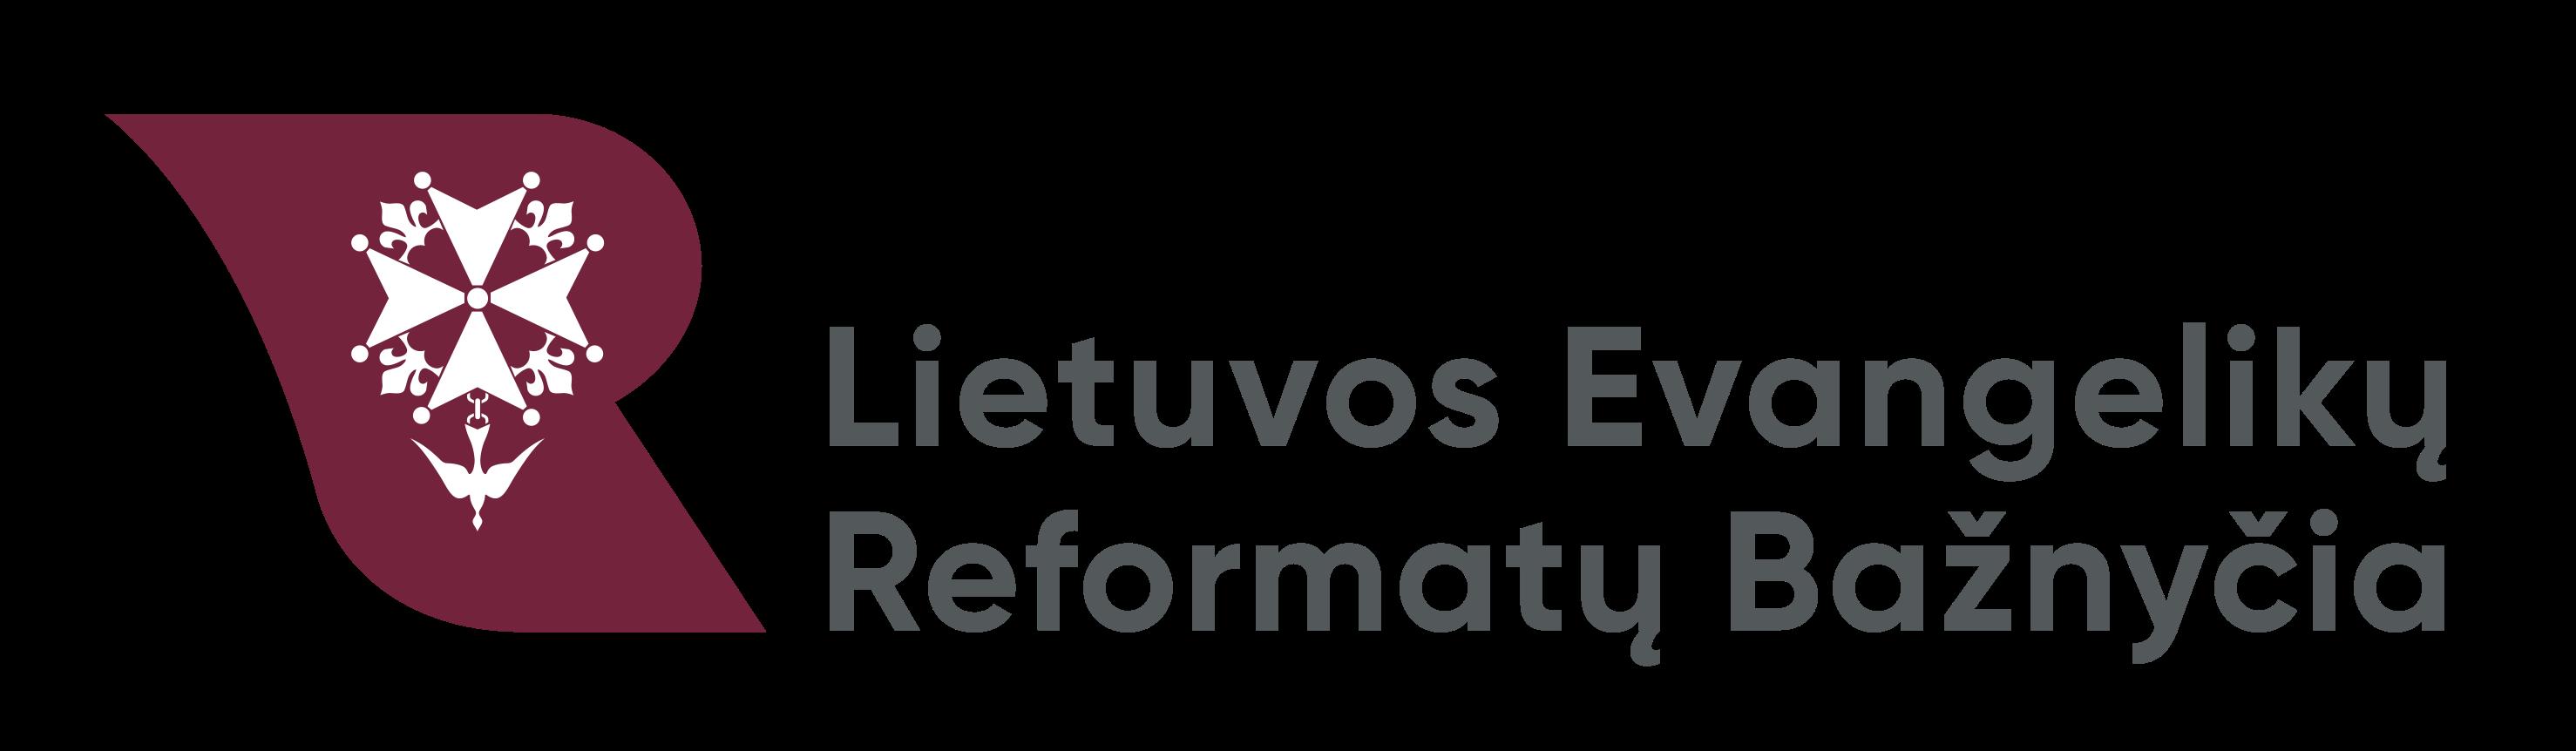 Reformatų Bažnyčia